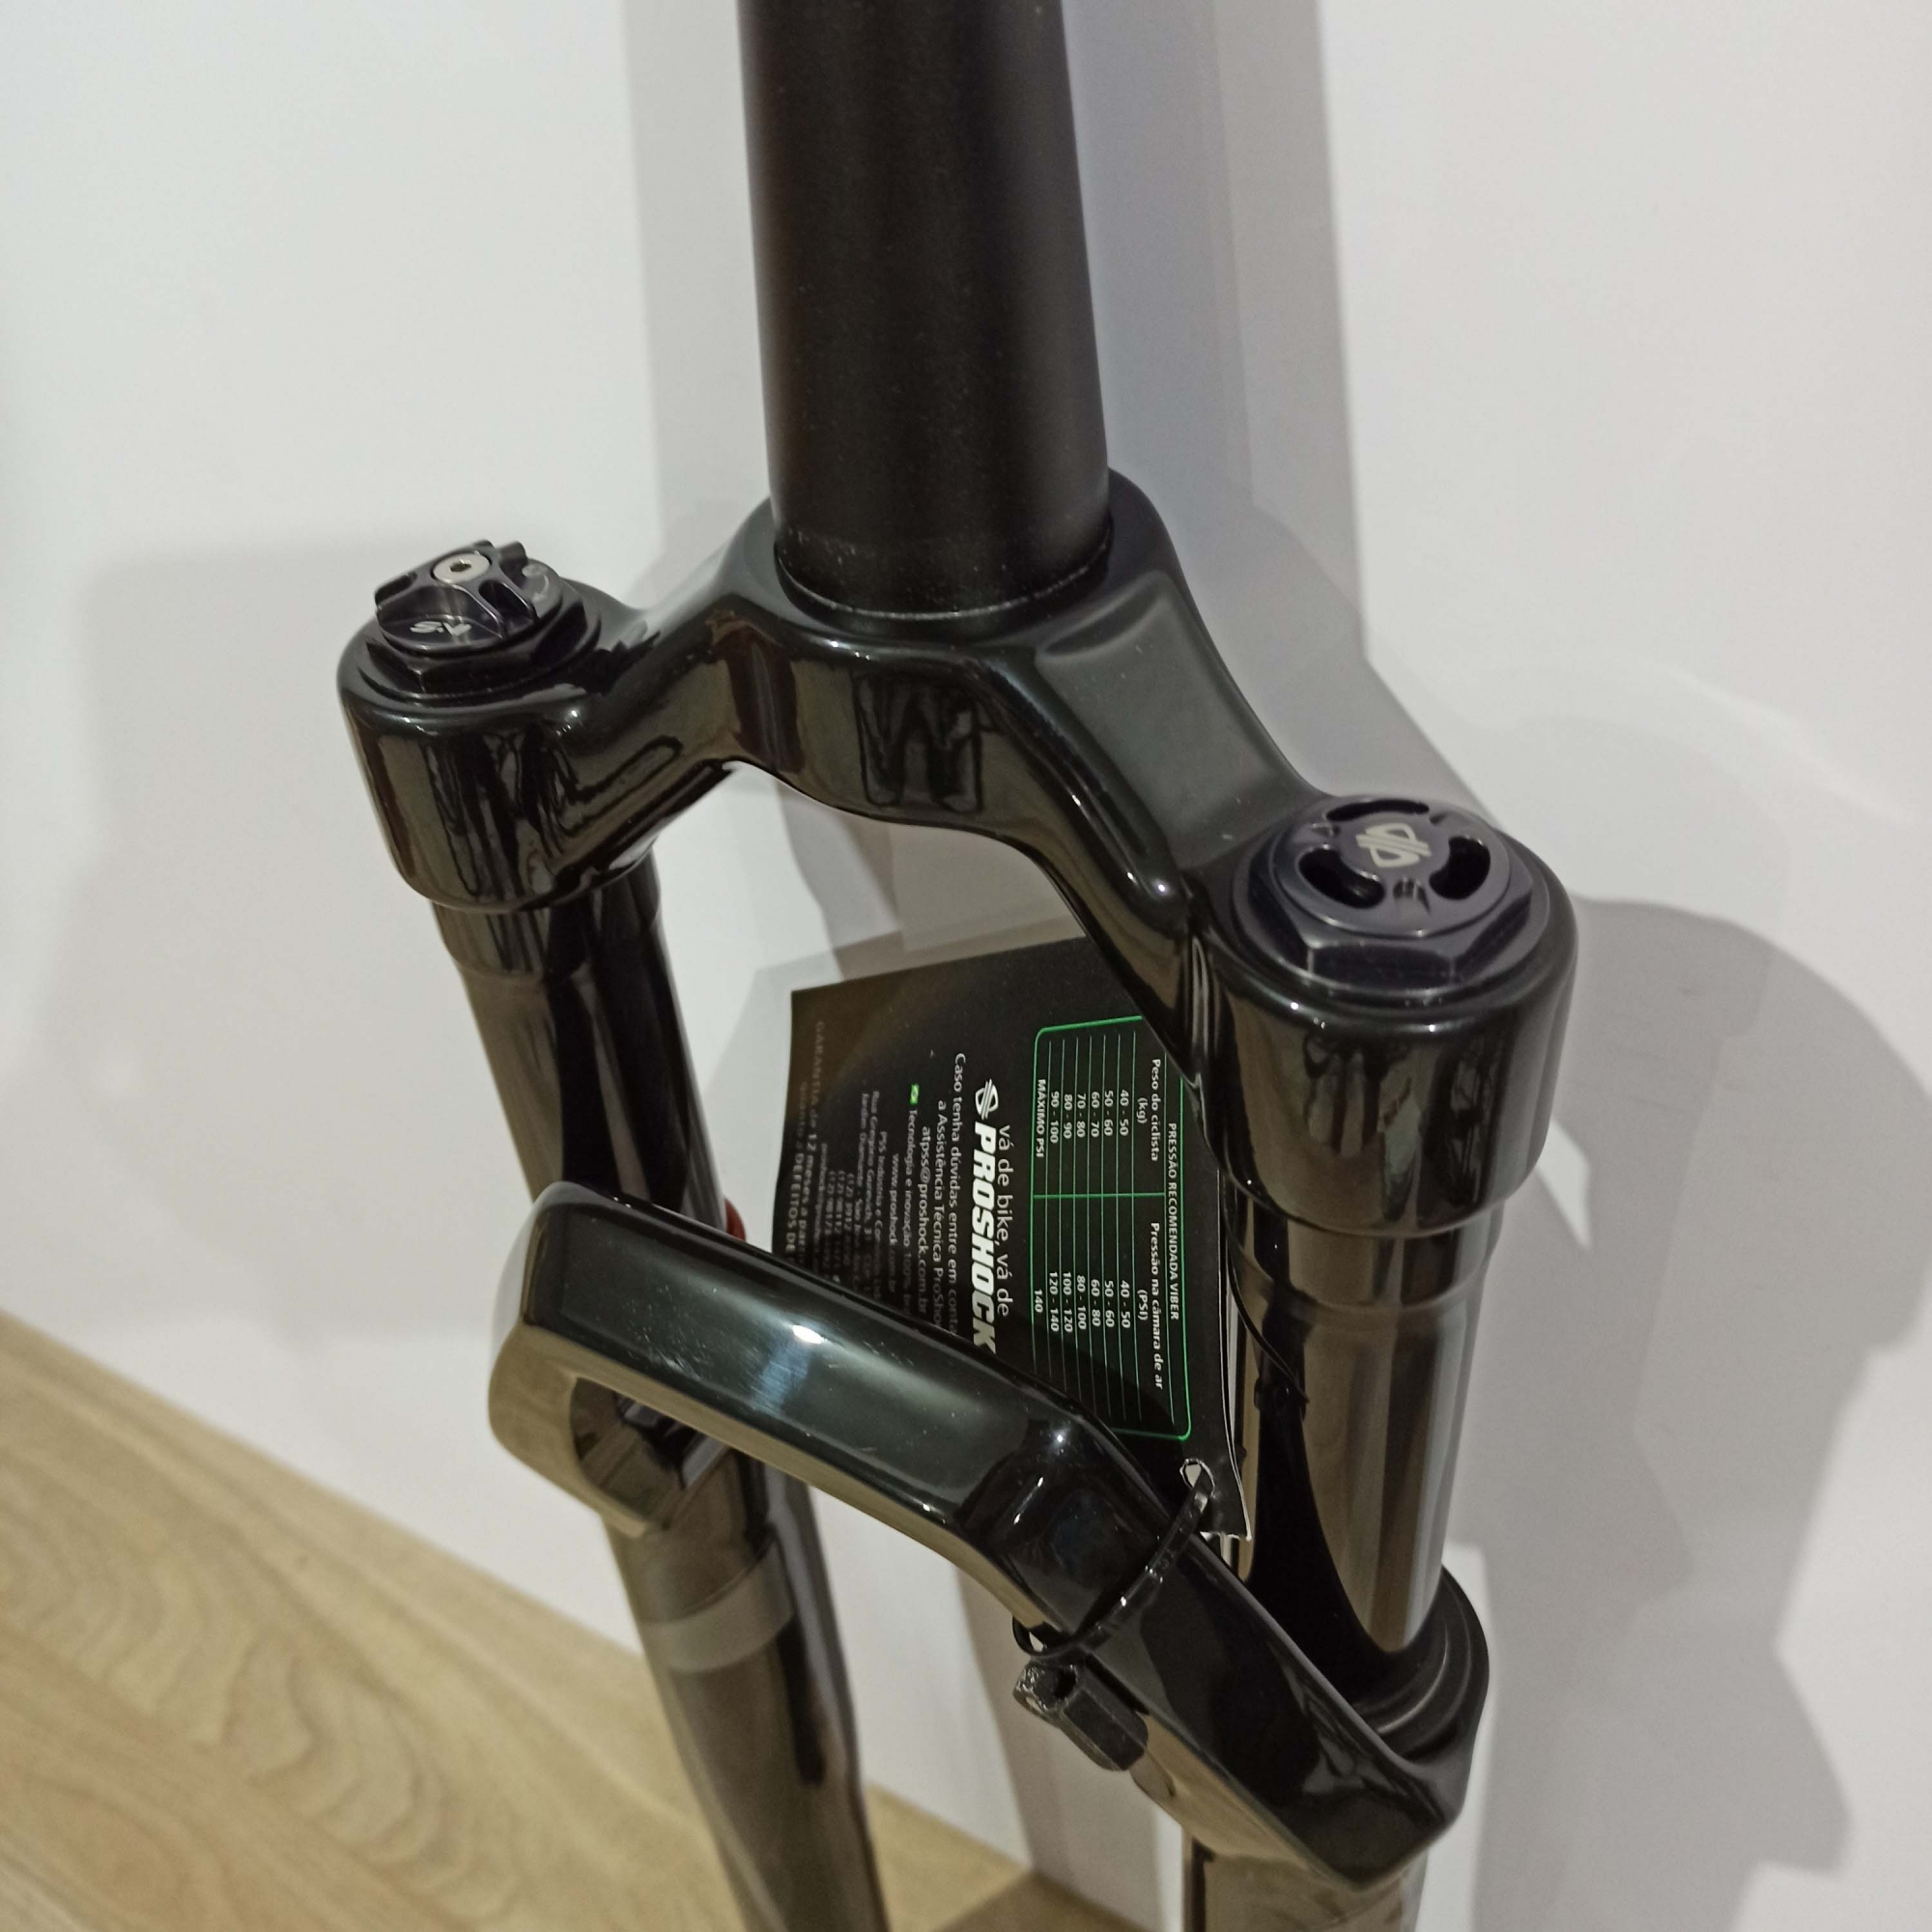 Suspensão 29 PROSHOCK Viber Spider 2021 Tapered Eixo de 9 mm Cor Preto